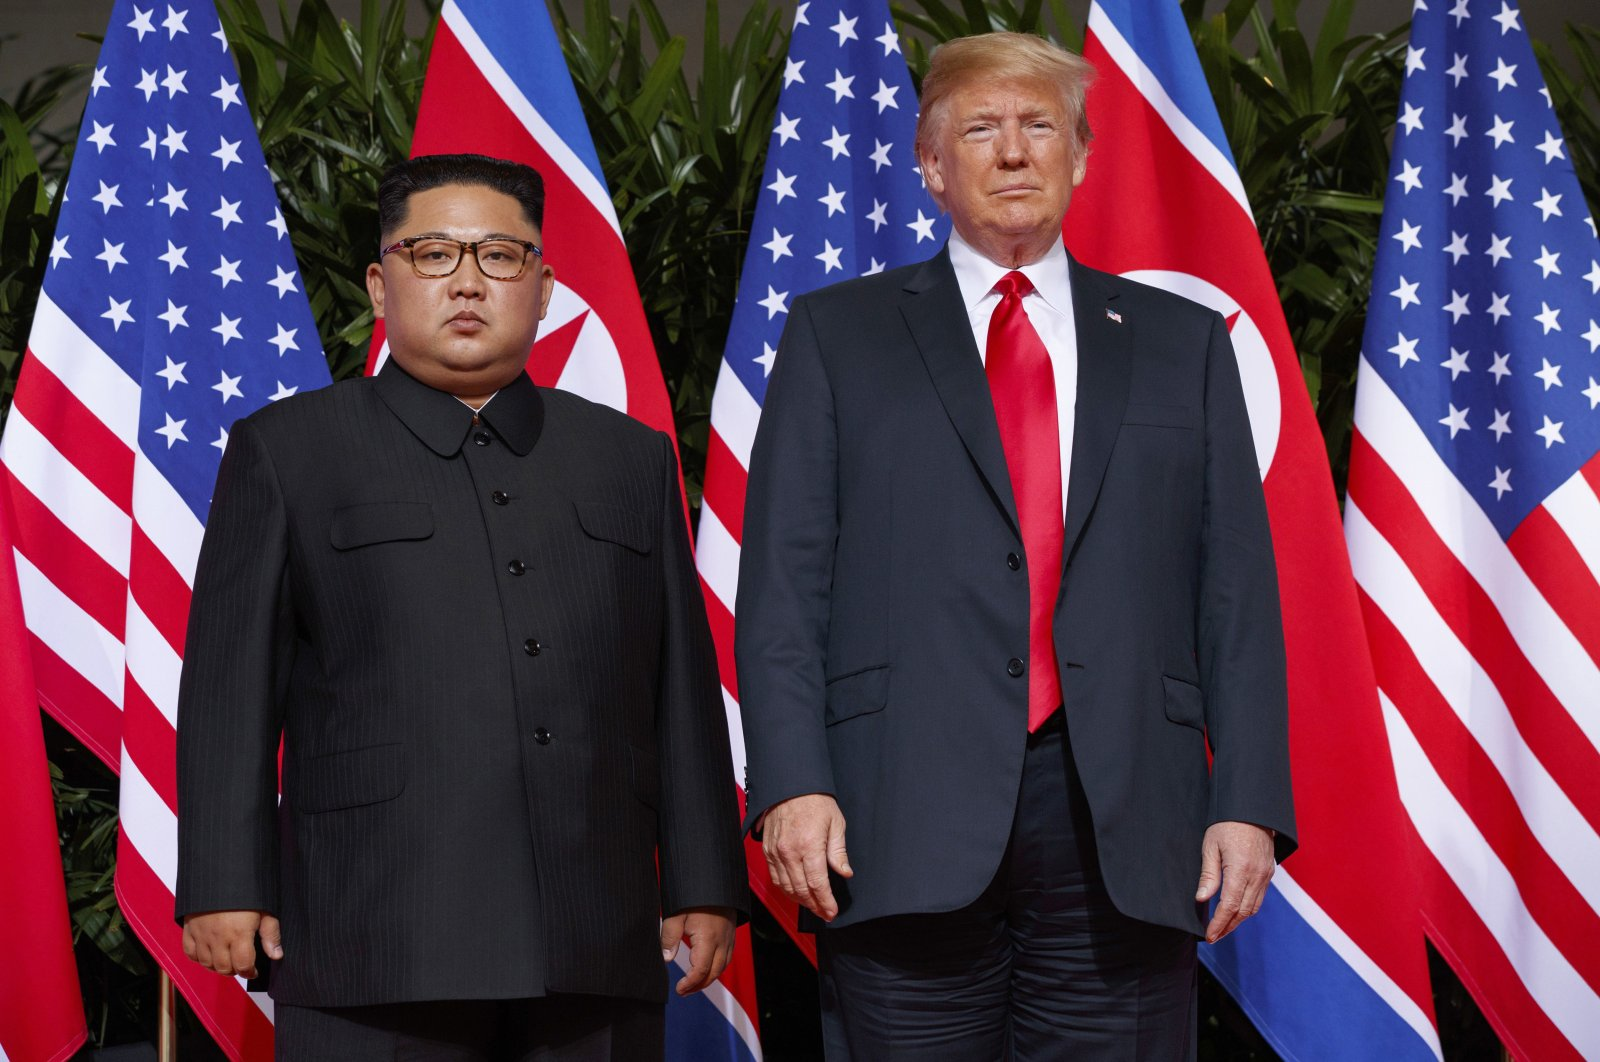 U.S. President Donald Trump meets with North Korean leader Kim Jong Un on Sentosa Island, Singapore, June 12, 2018. (AP Photo)